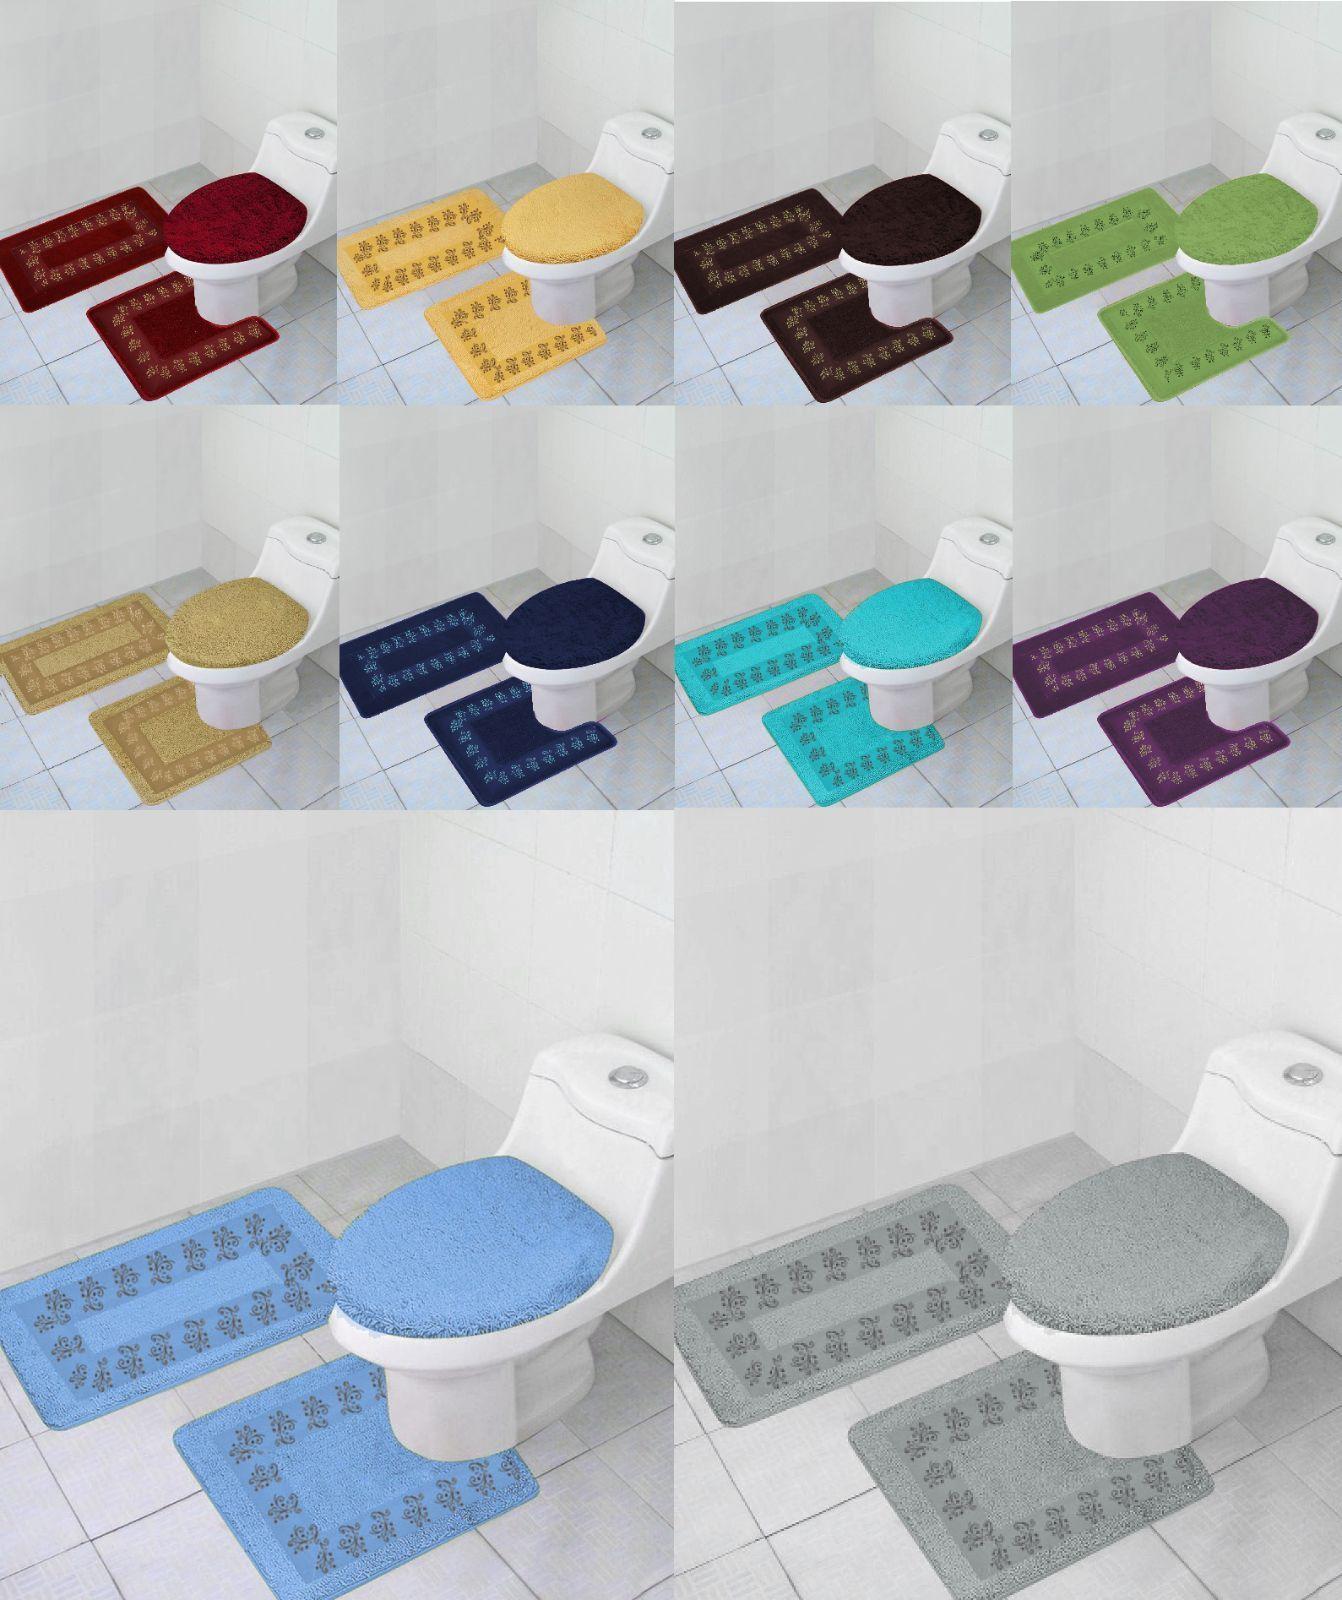 Bathroom Set Rug Contour Mat Toilet Lid Cover Solid Embroidery Bathmats 5 3pc Bath Rugs